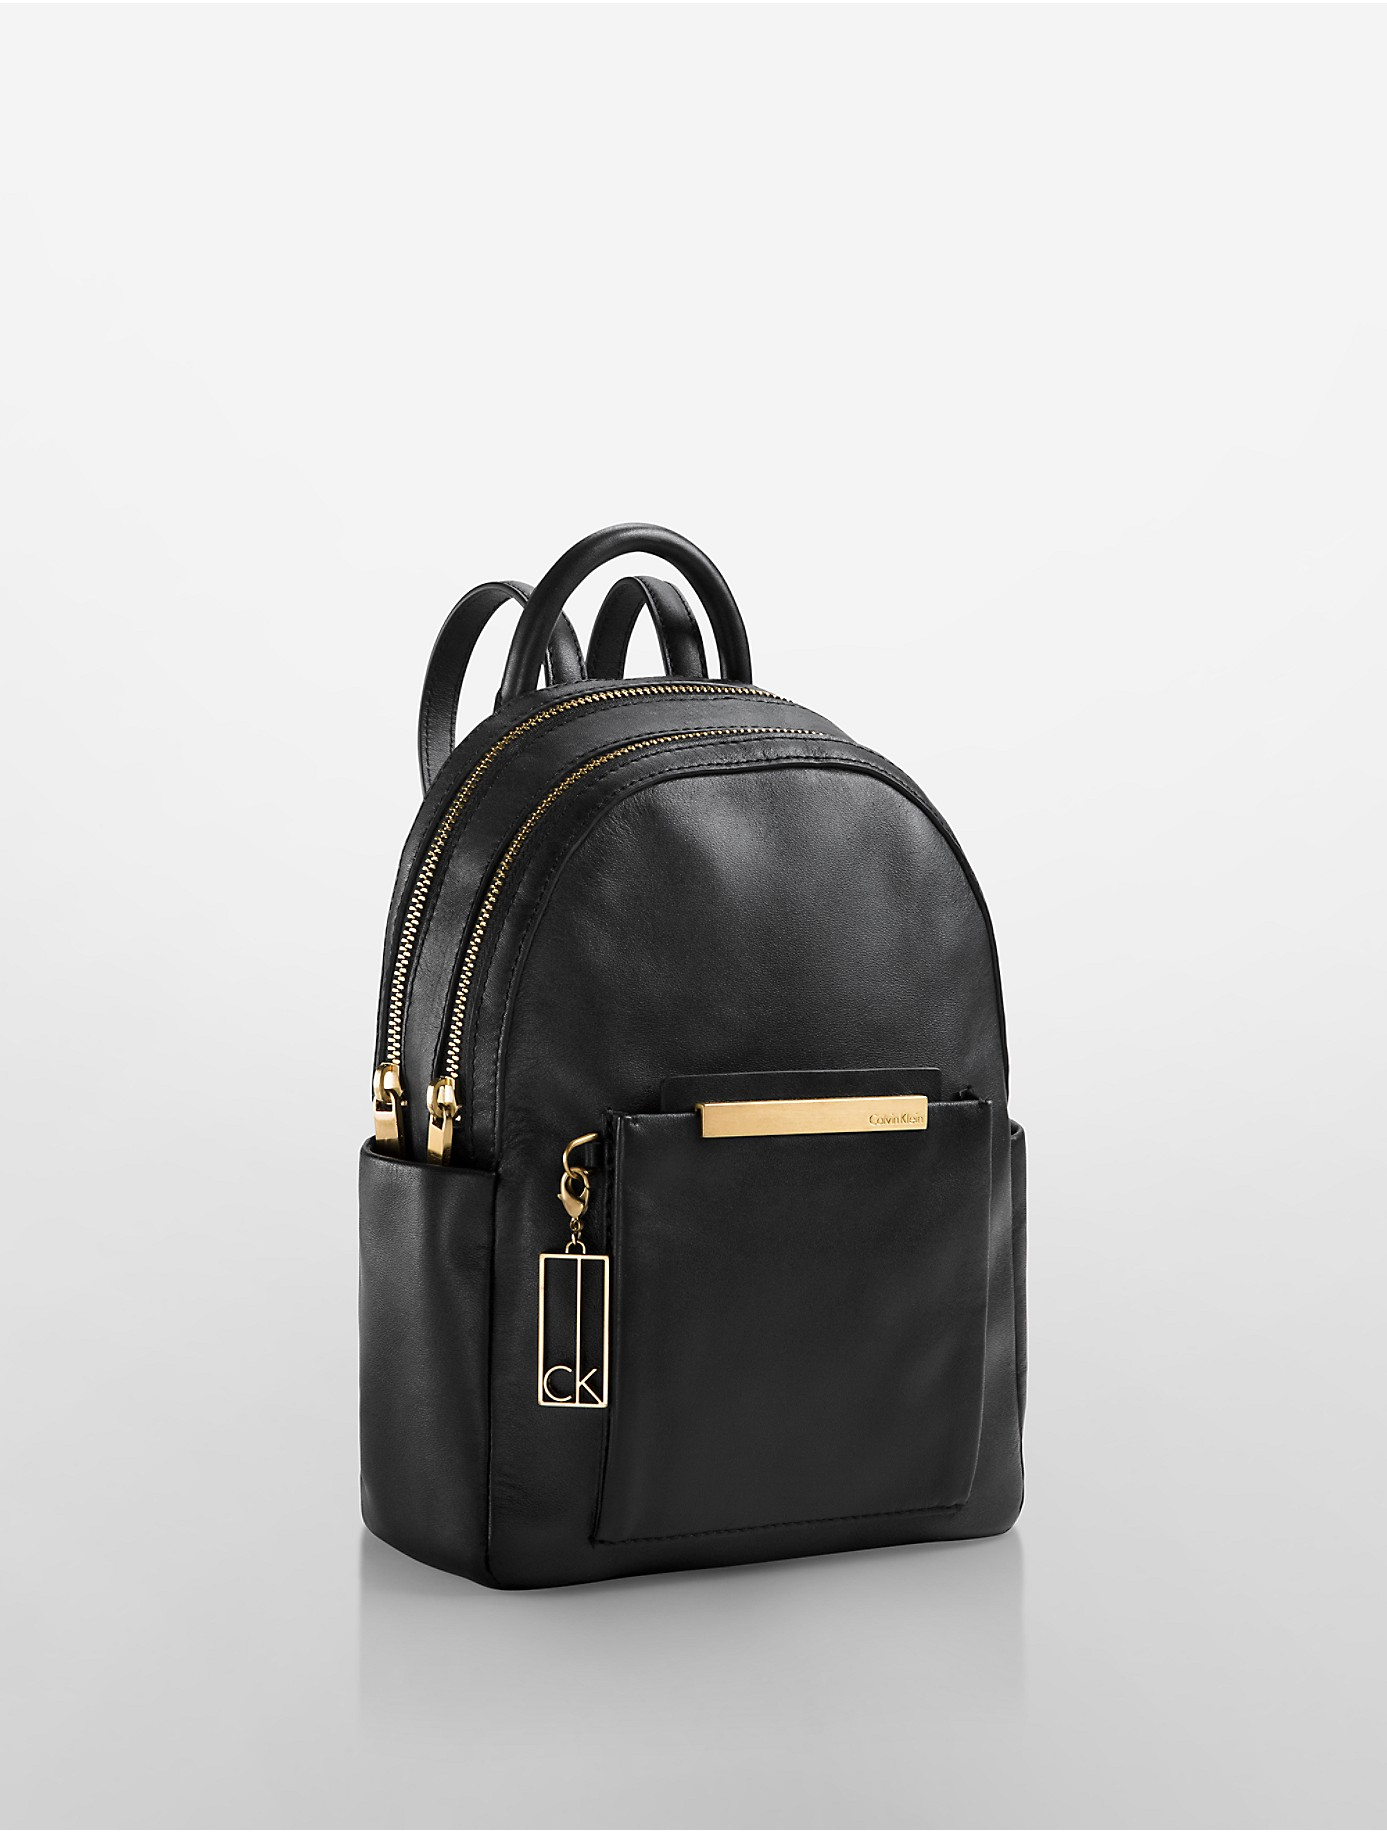 calvin klein kenner leather double zip studio backpack in. Black Bedroom Furniture Sets. Home Design Ideas